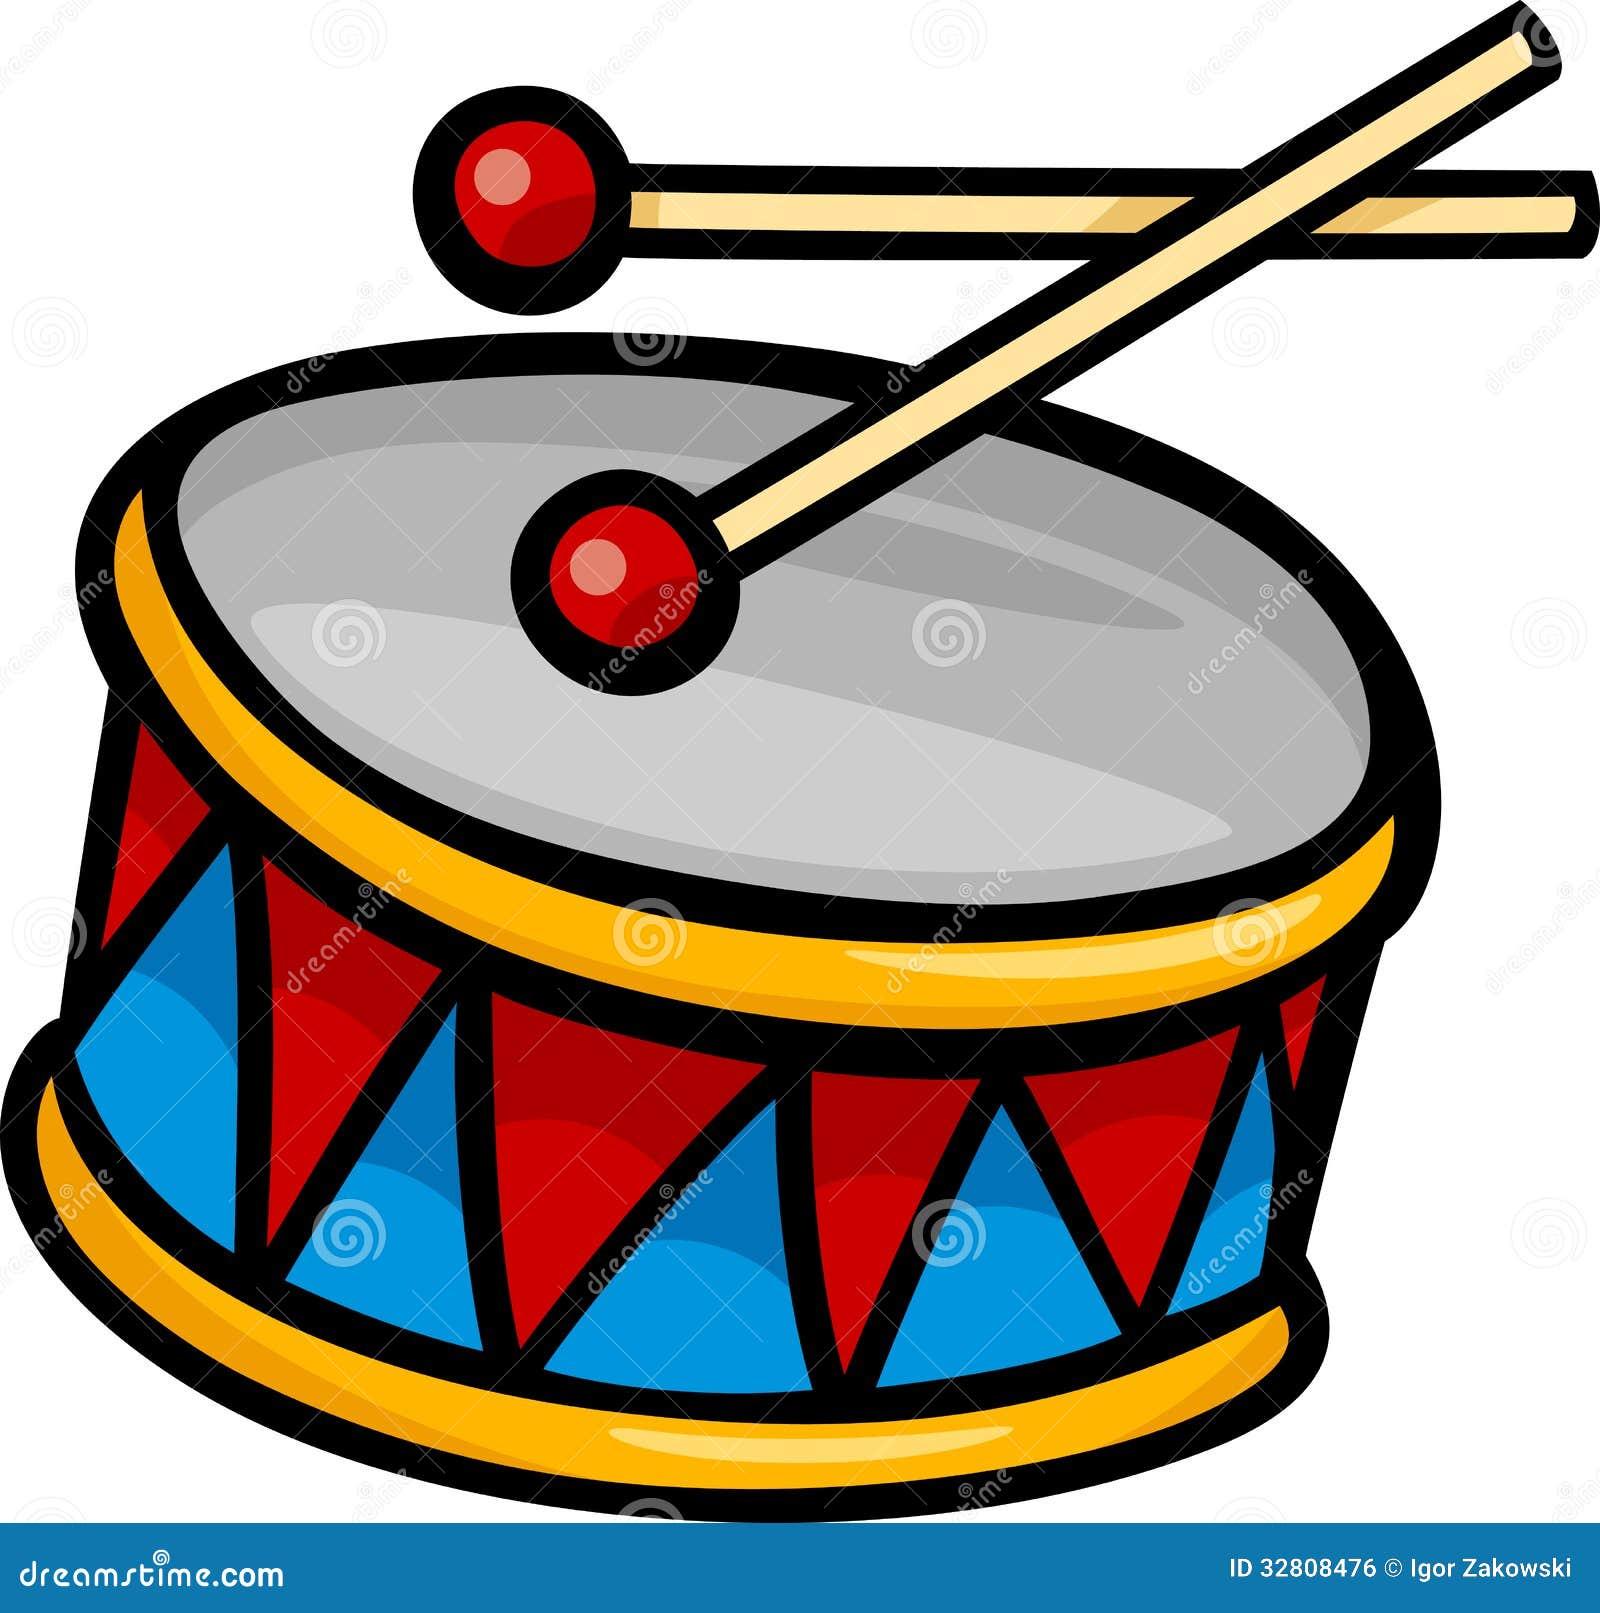 Drum Clip Art Cartoon Illustration Royalty Free Stock Image - Image ...